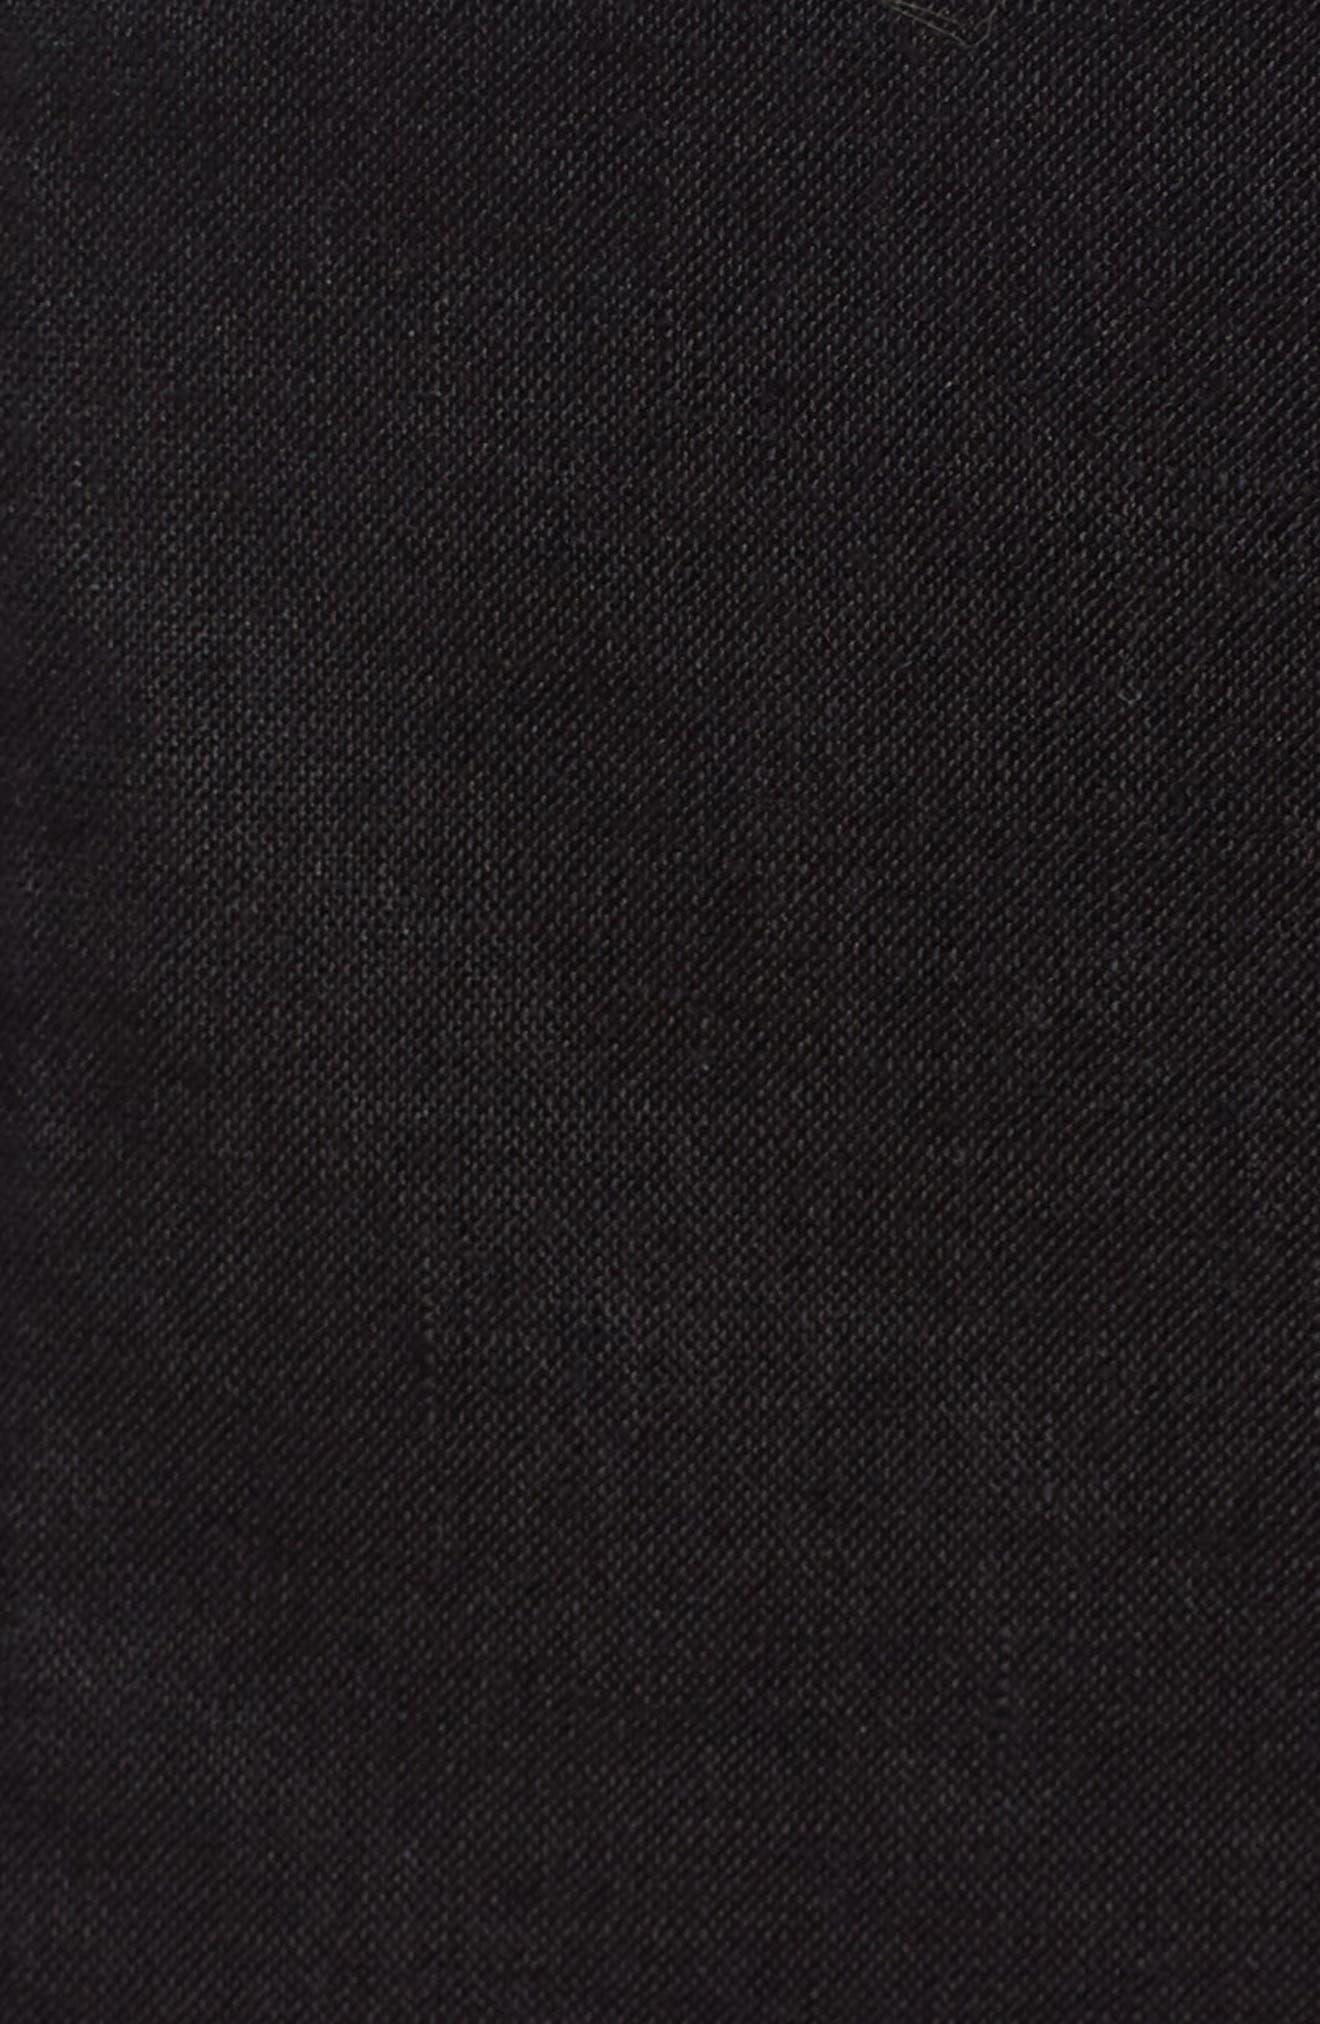 EILEEN FISHER,                             Organic Linen City Shorts,                             Alternate thumbnail 5, color,                             001